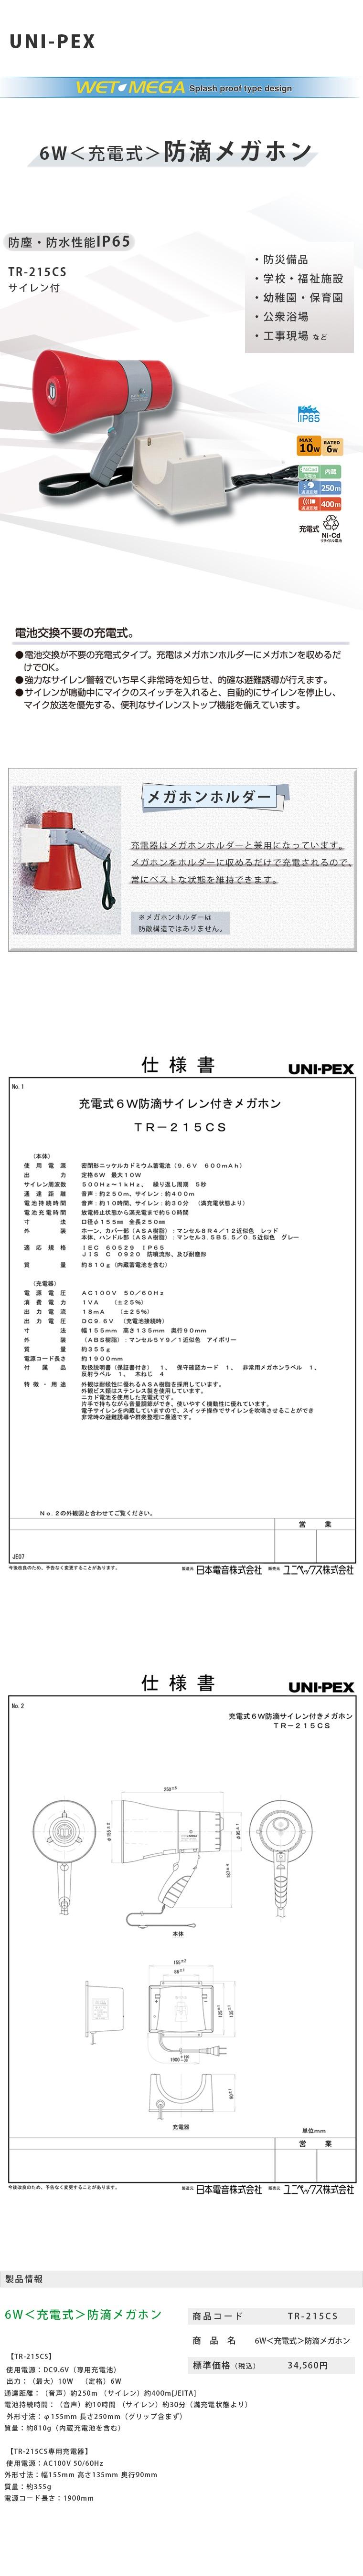 TR-215CS